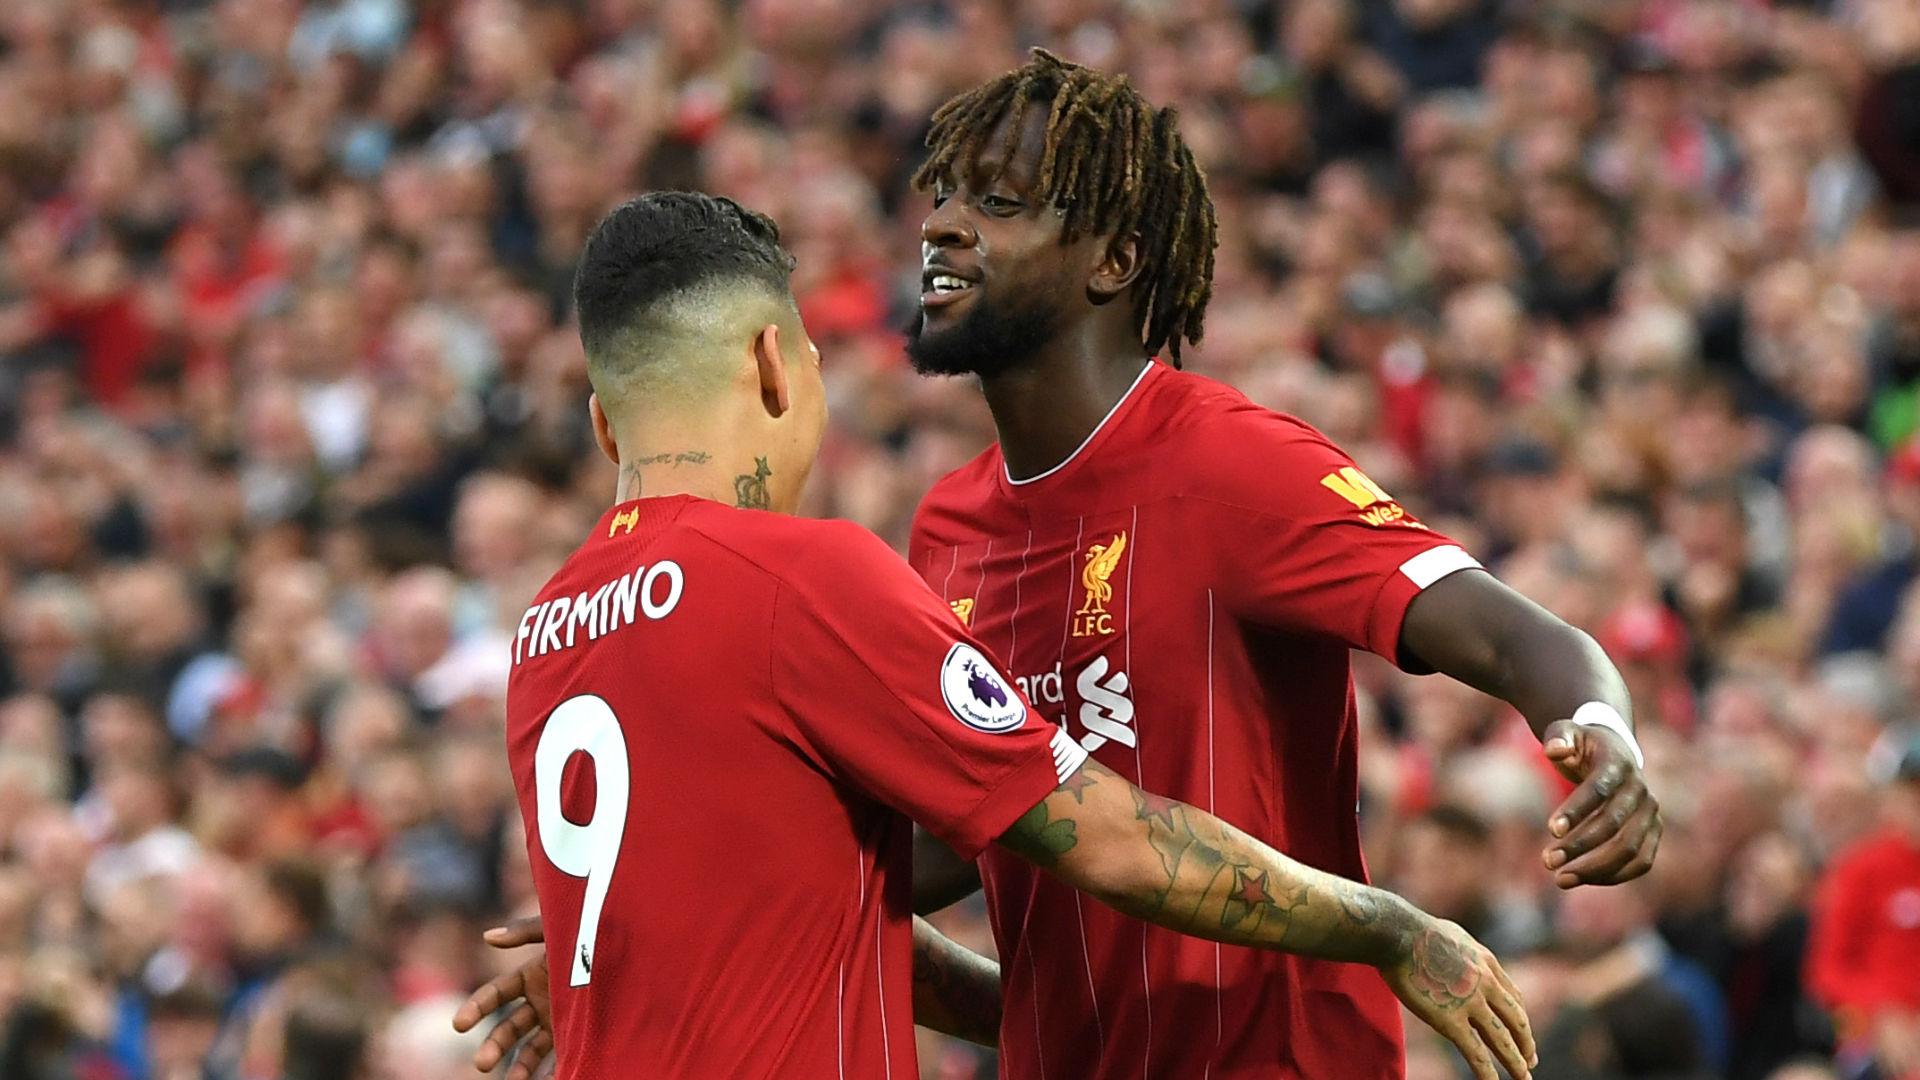 Origi Firmino Liverpool 2019-20